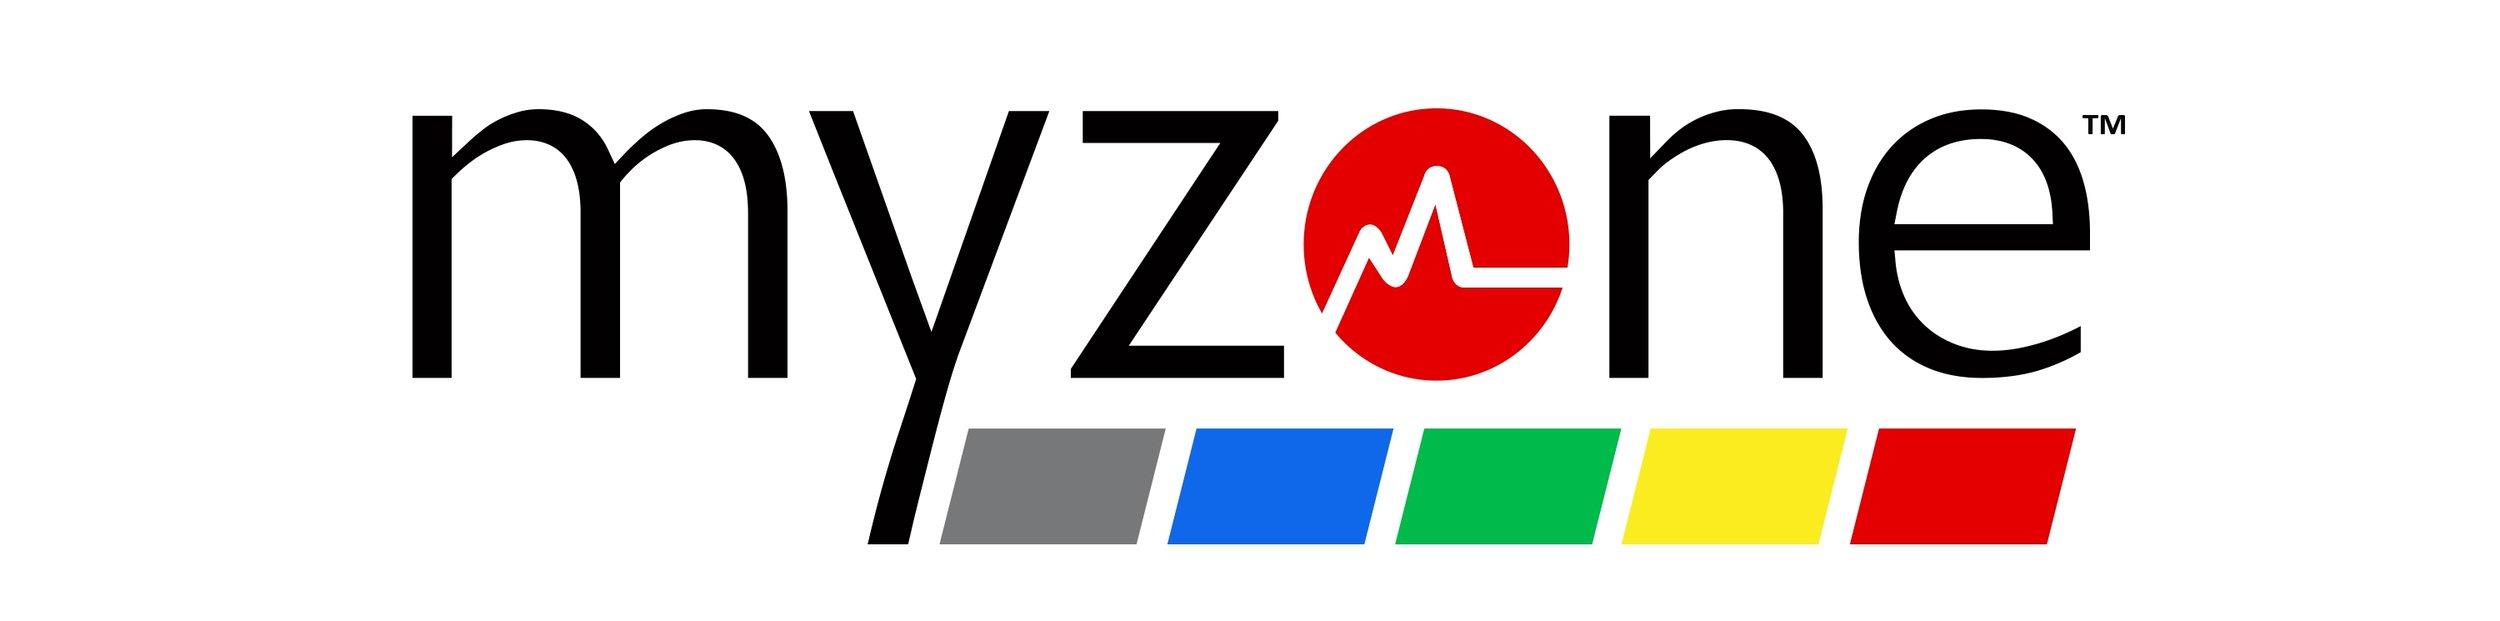 company-logo,-fonts_3000x2168.jpg